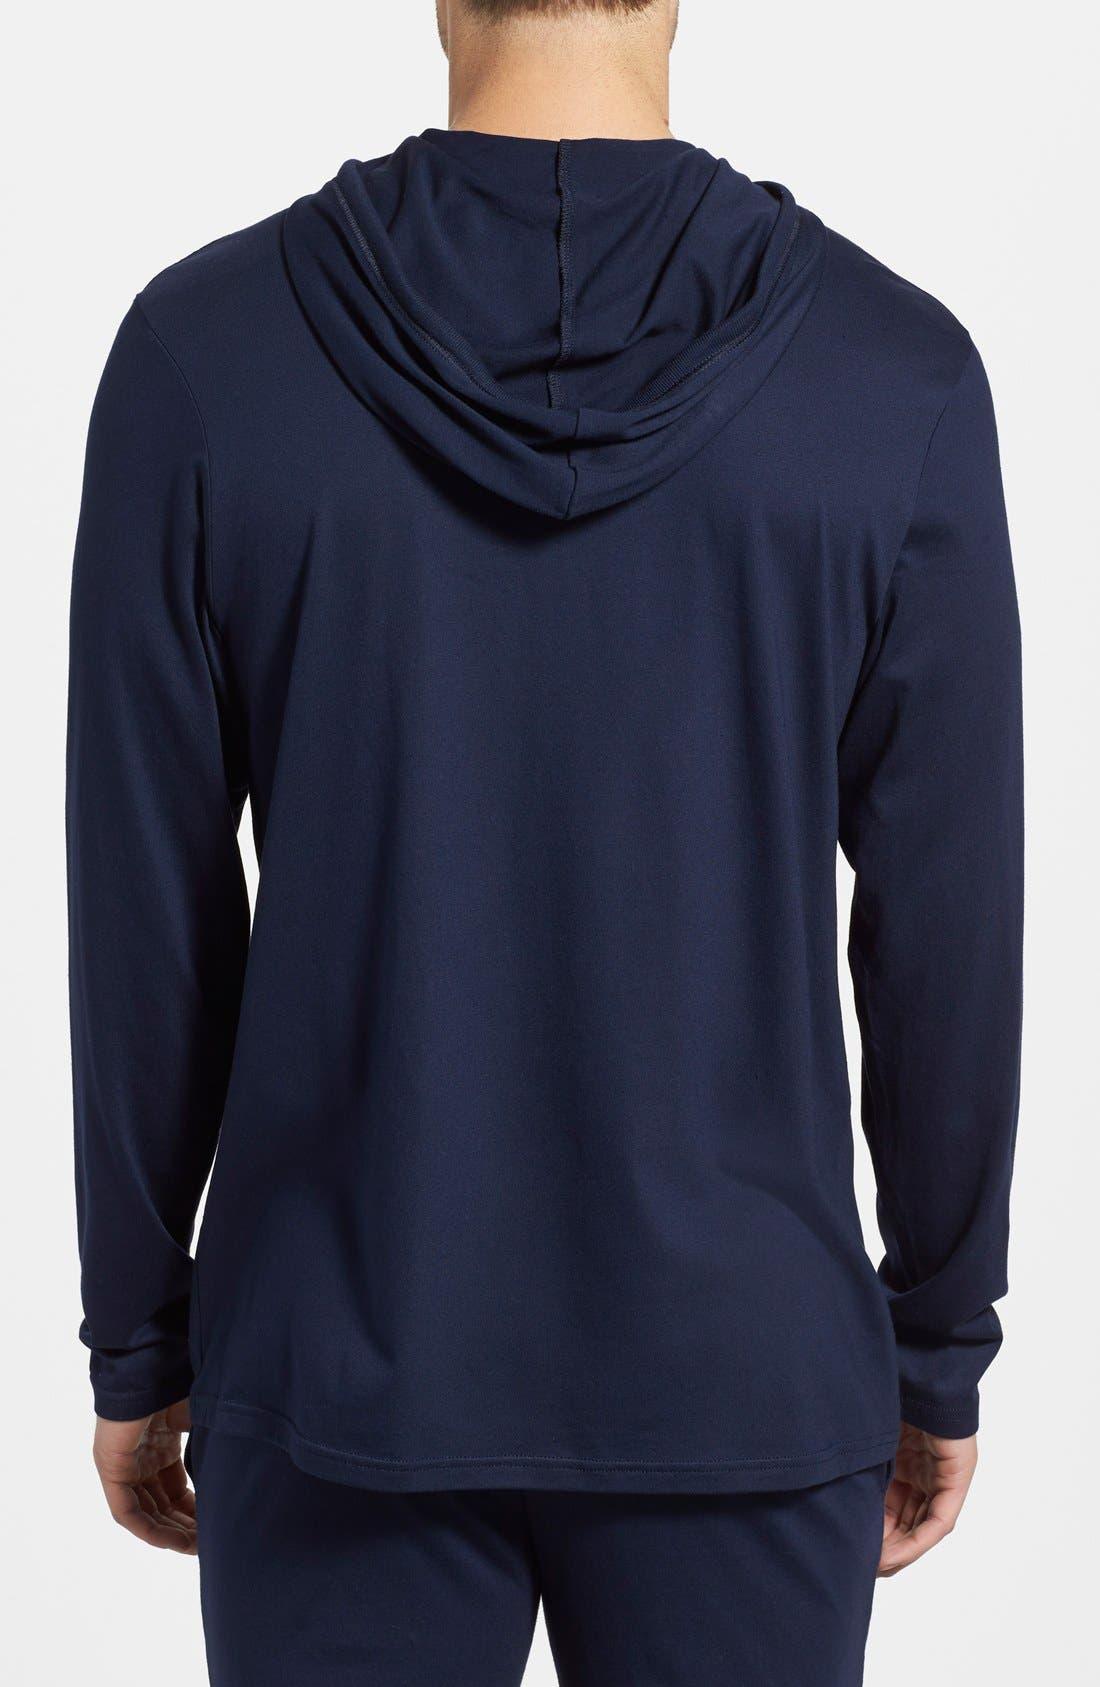 73dd910c6e7e Men s Hoodies   Sweatshirts